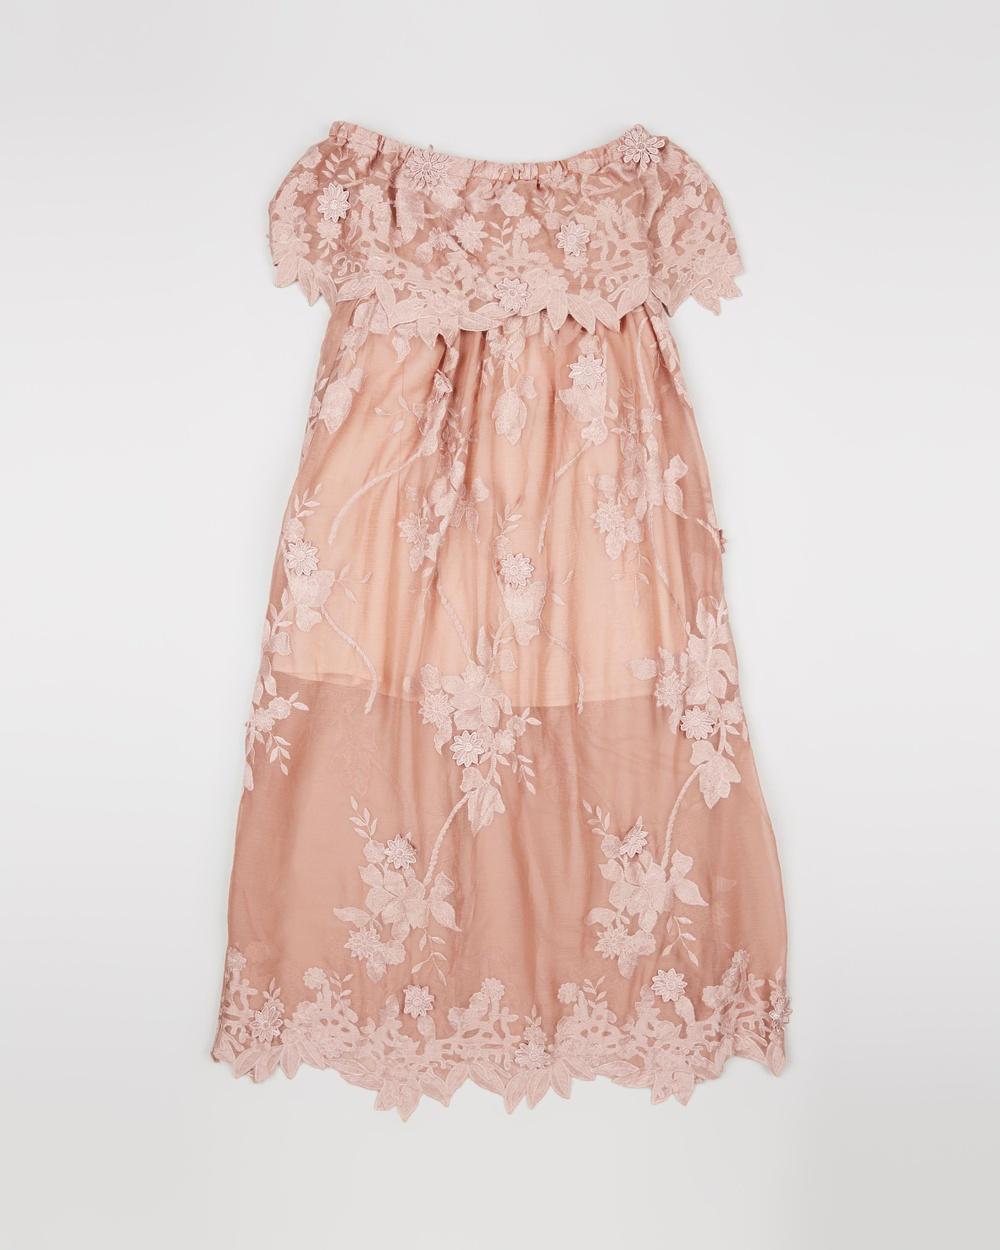 Marlo Rose Amaranth Lace Maxi Dress – Teens